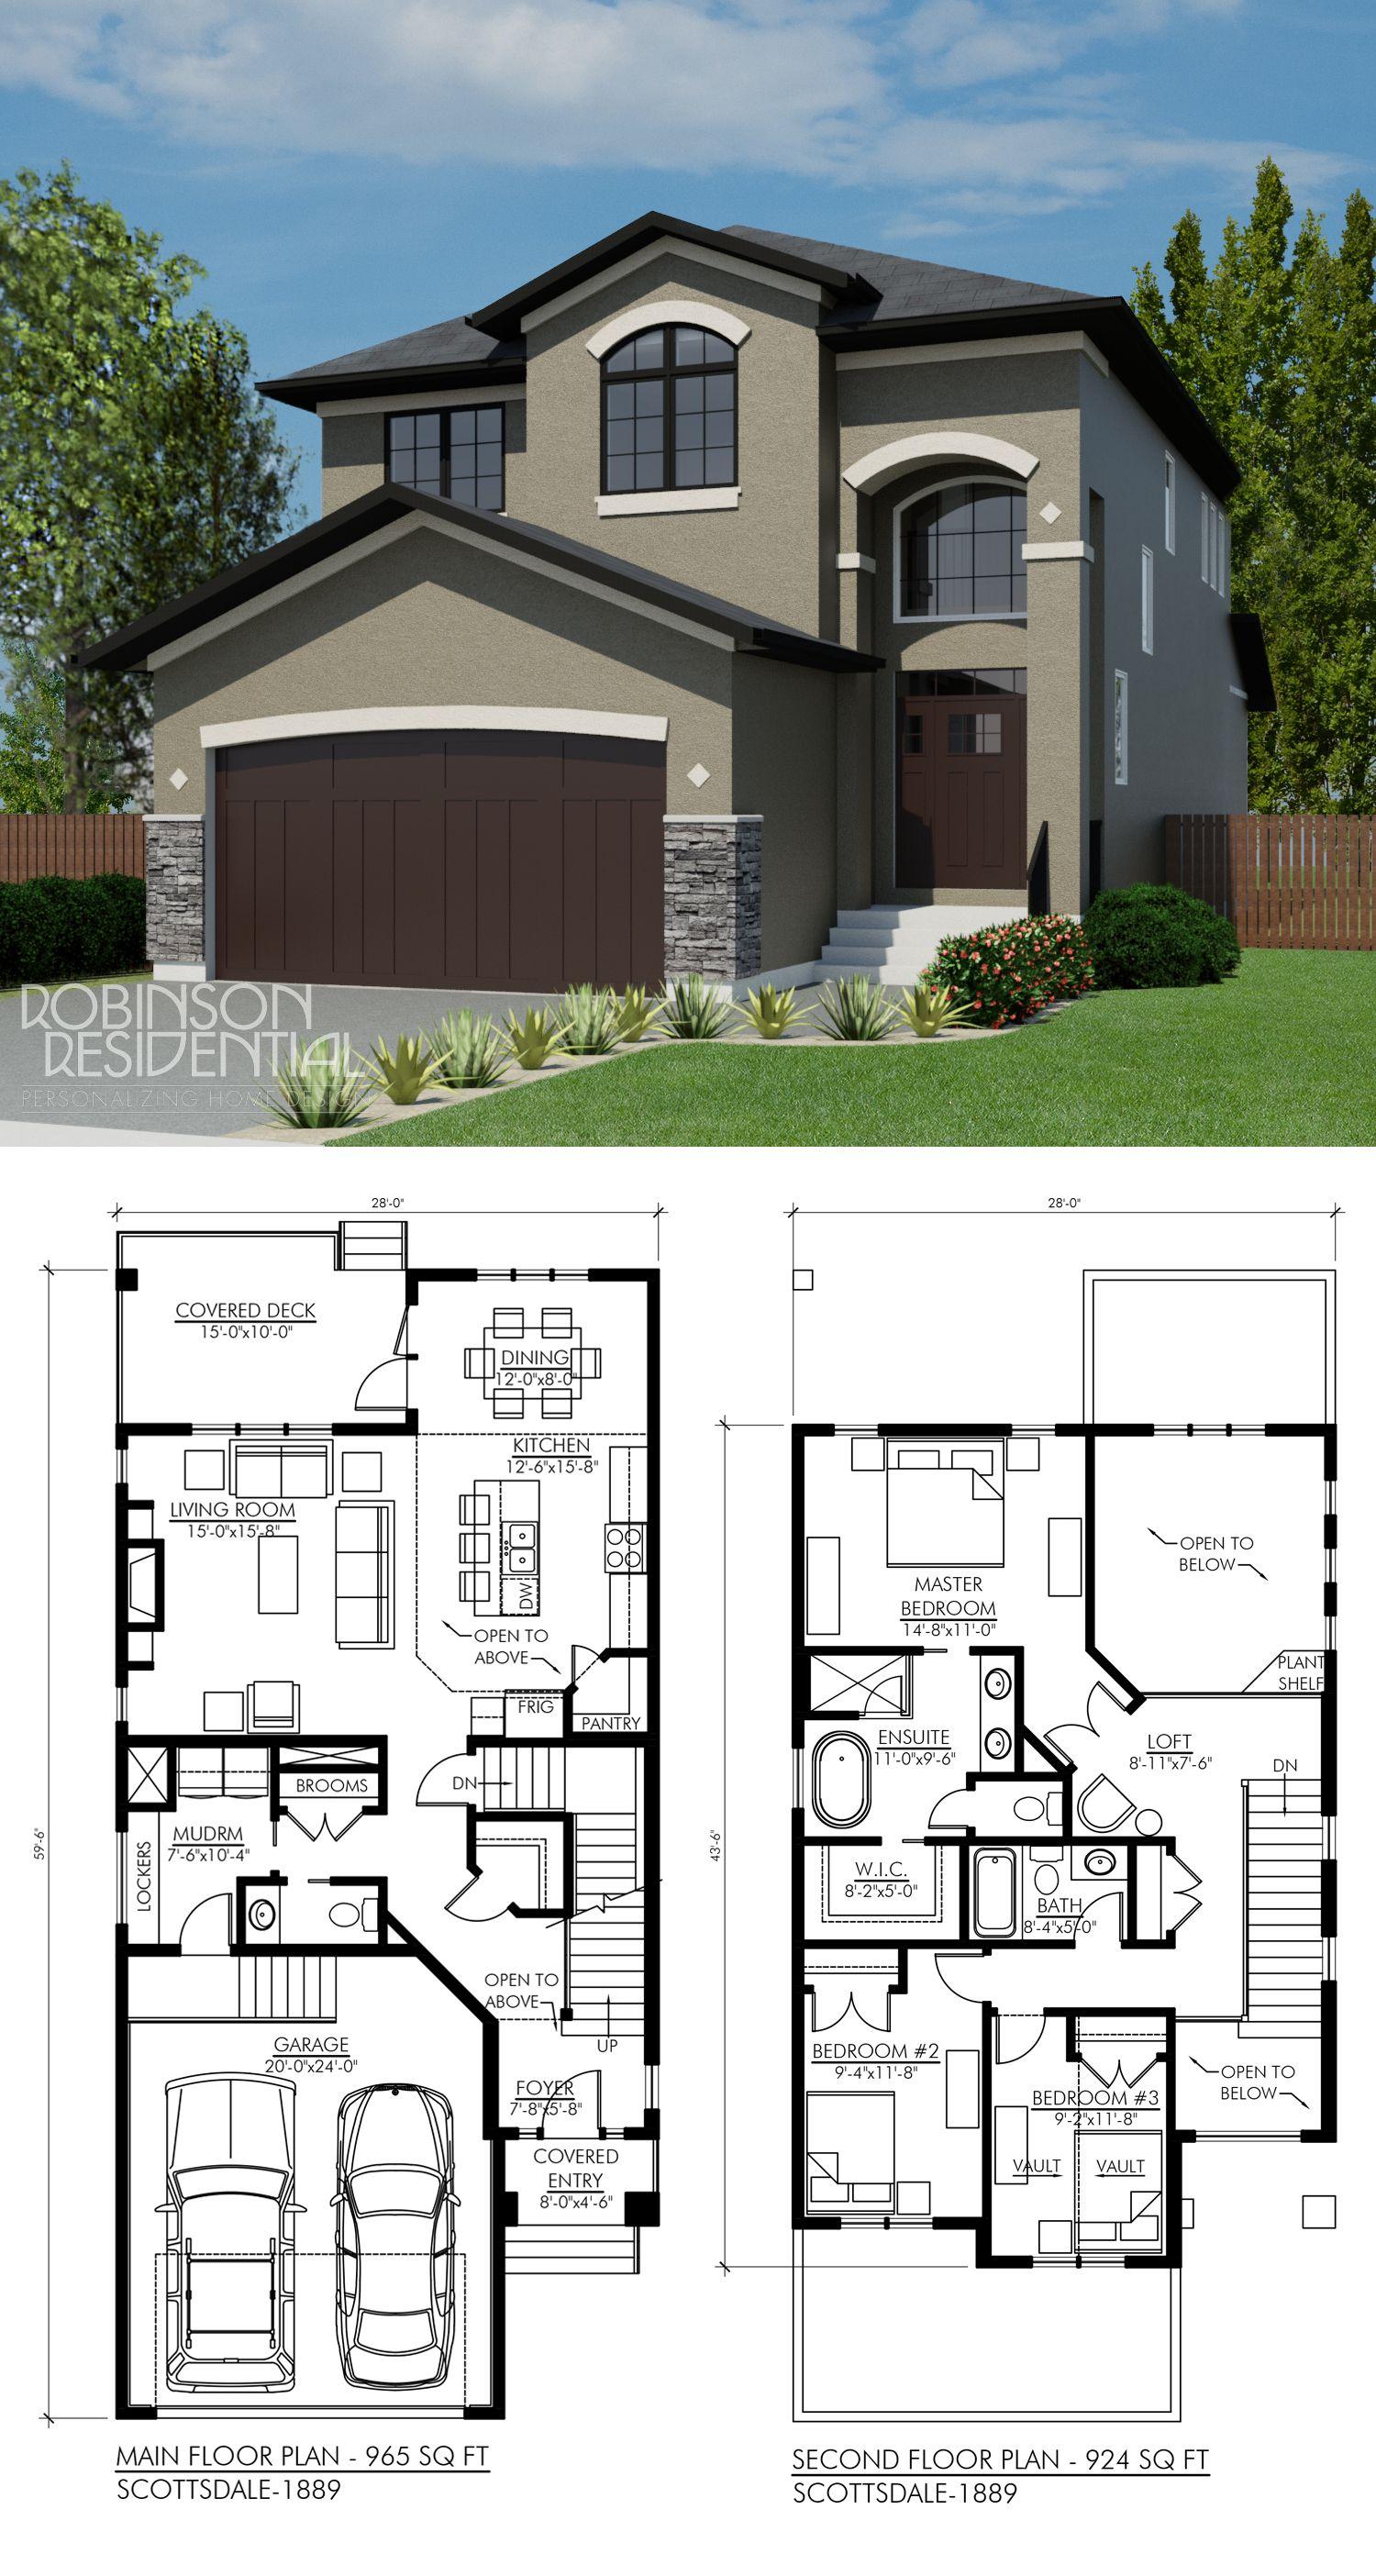 Mission Scottsdale 1889 Robinson Plans Sims House Plans House Layouts House Blueprints